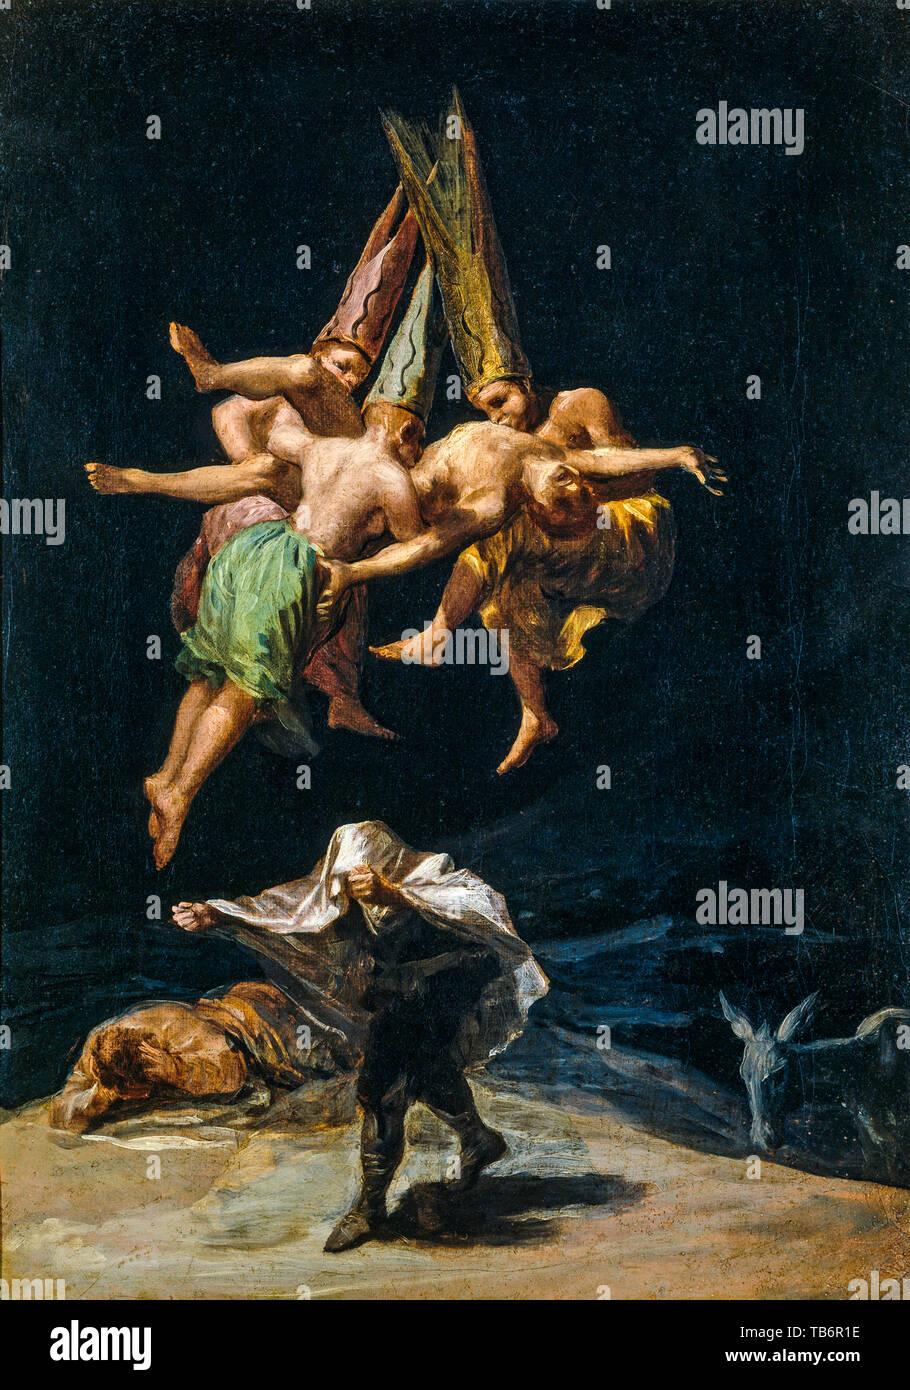 Francisco Goya Le Vol Des Sorcieres Peinture 1798 Photo Stock Alamy